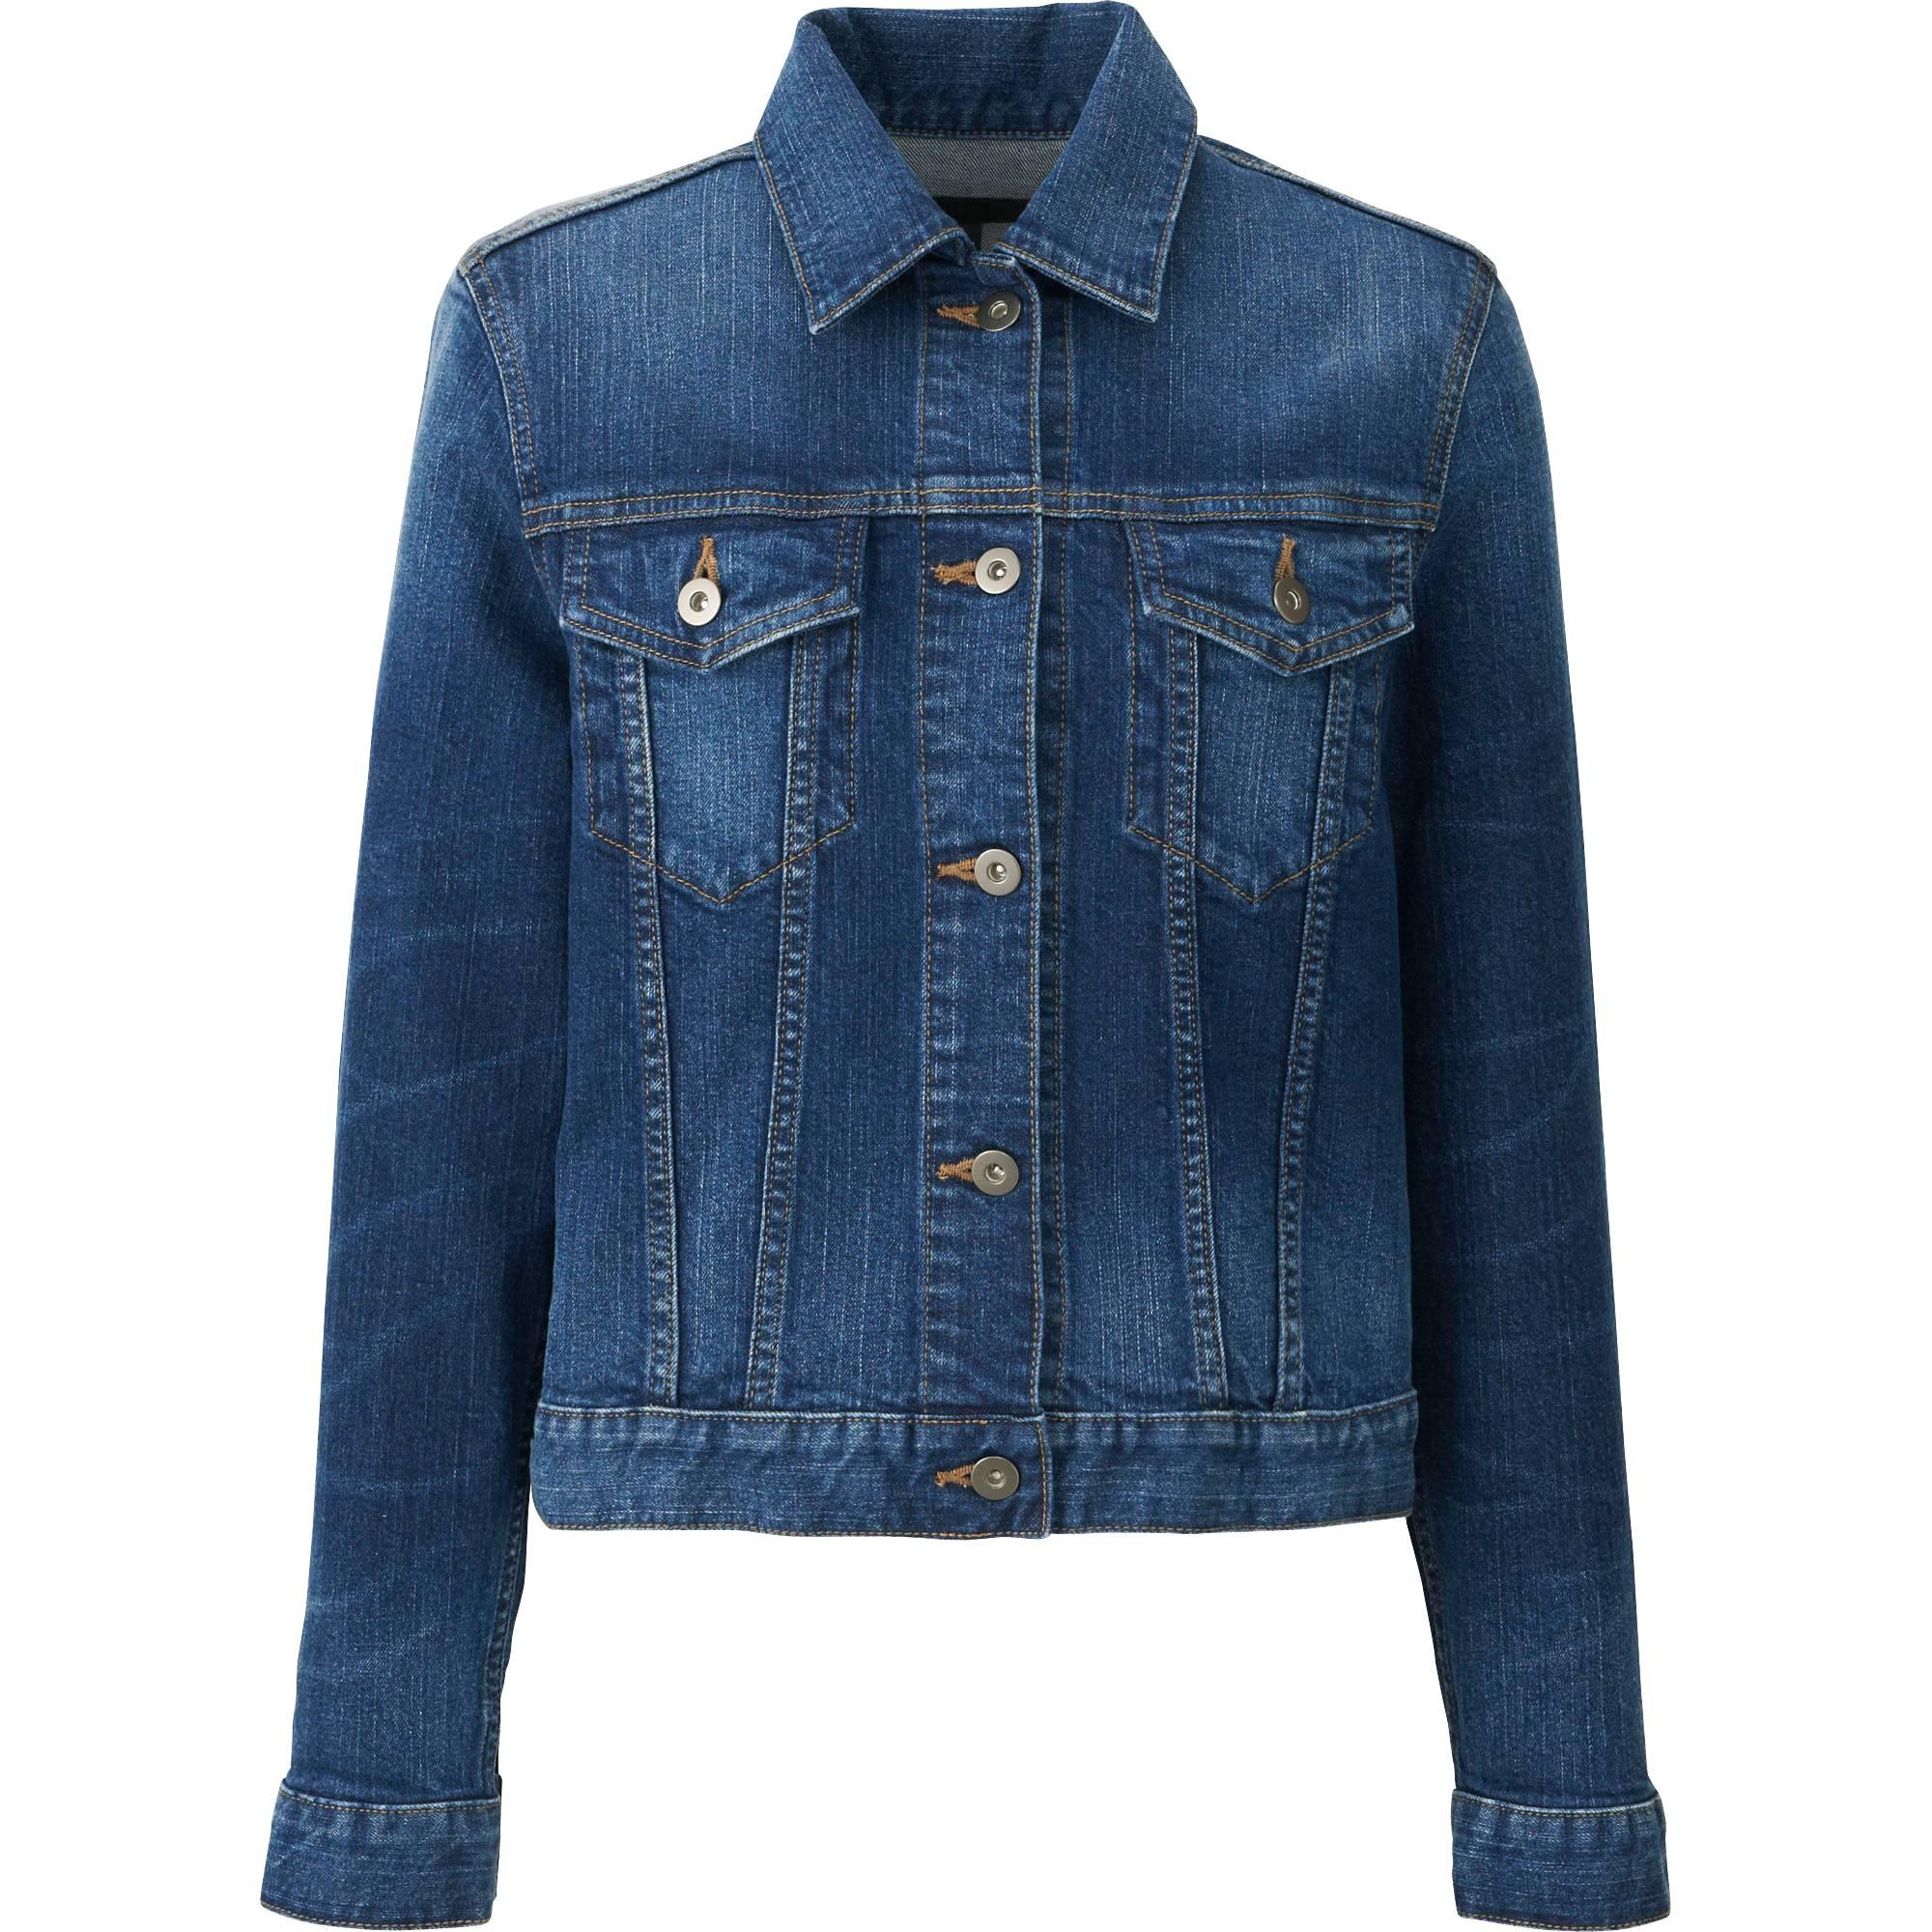 jean jacket opens a new window. btxubyz